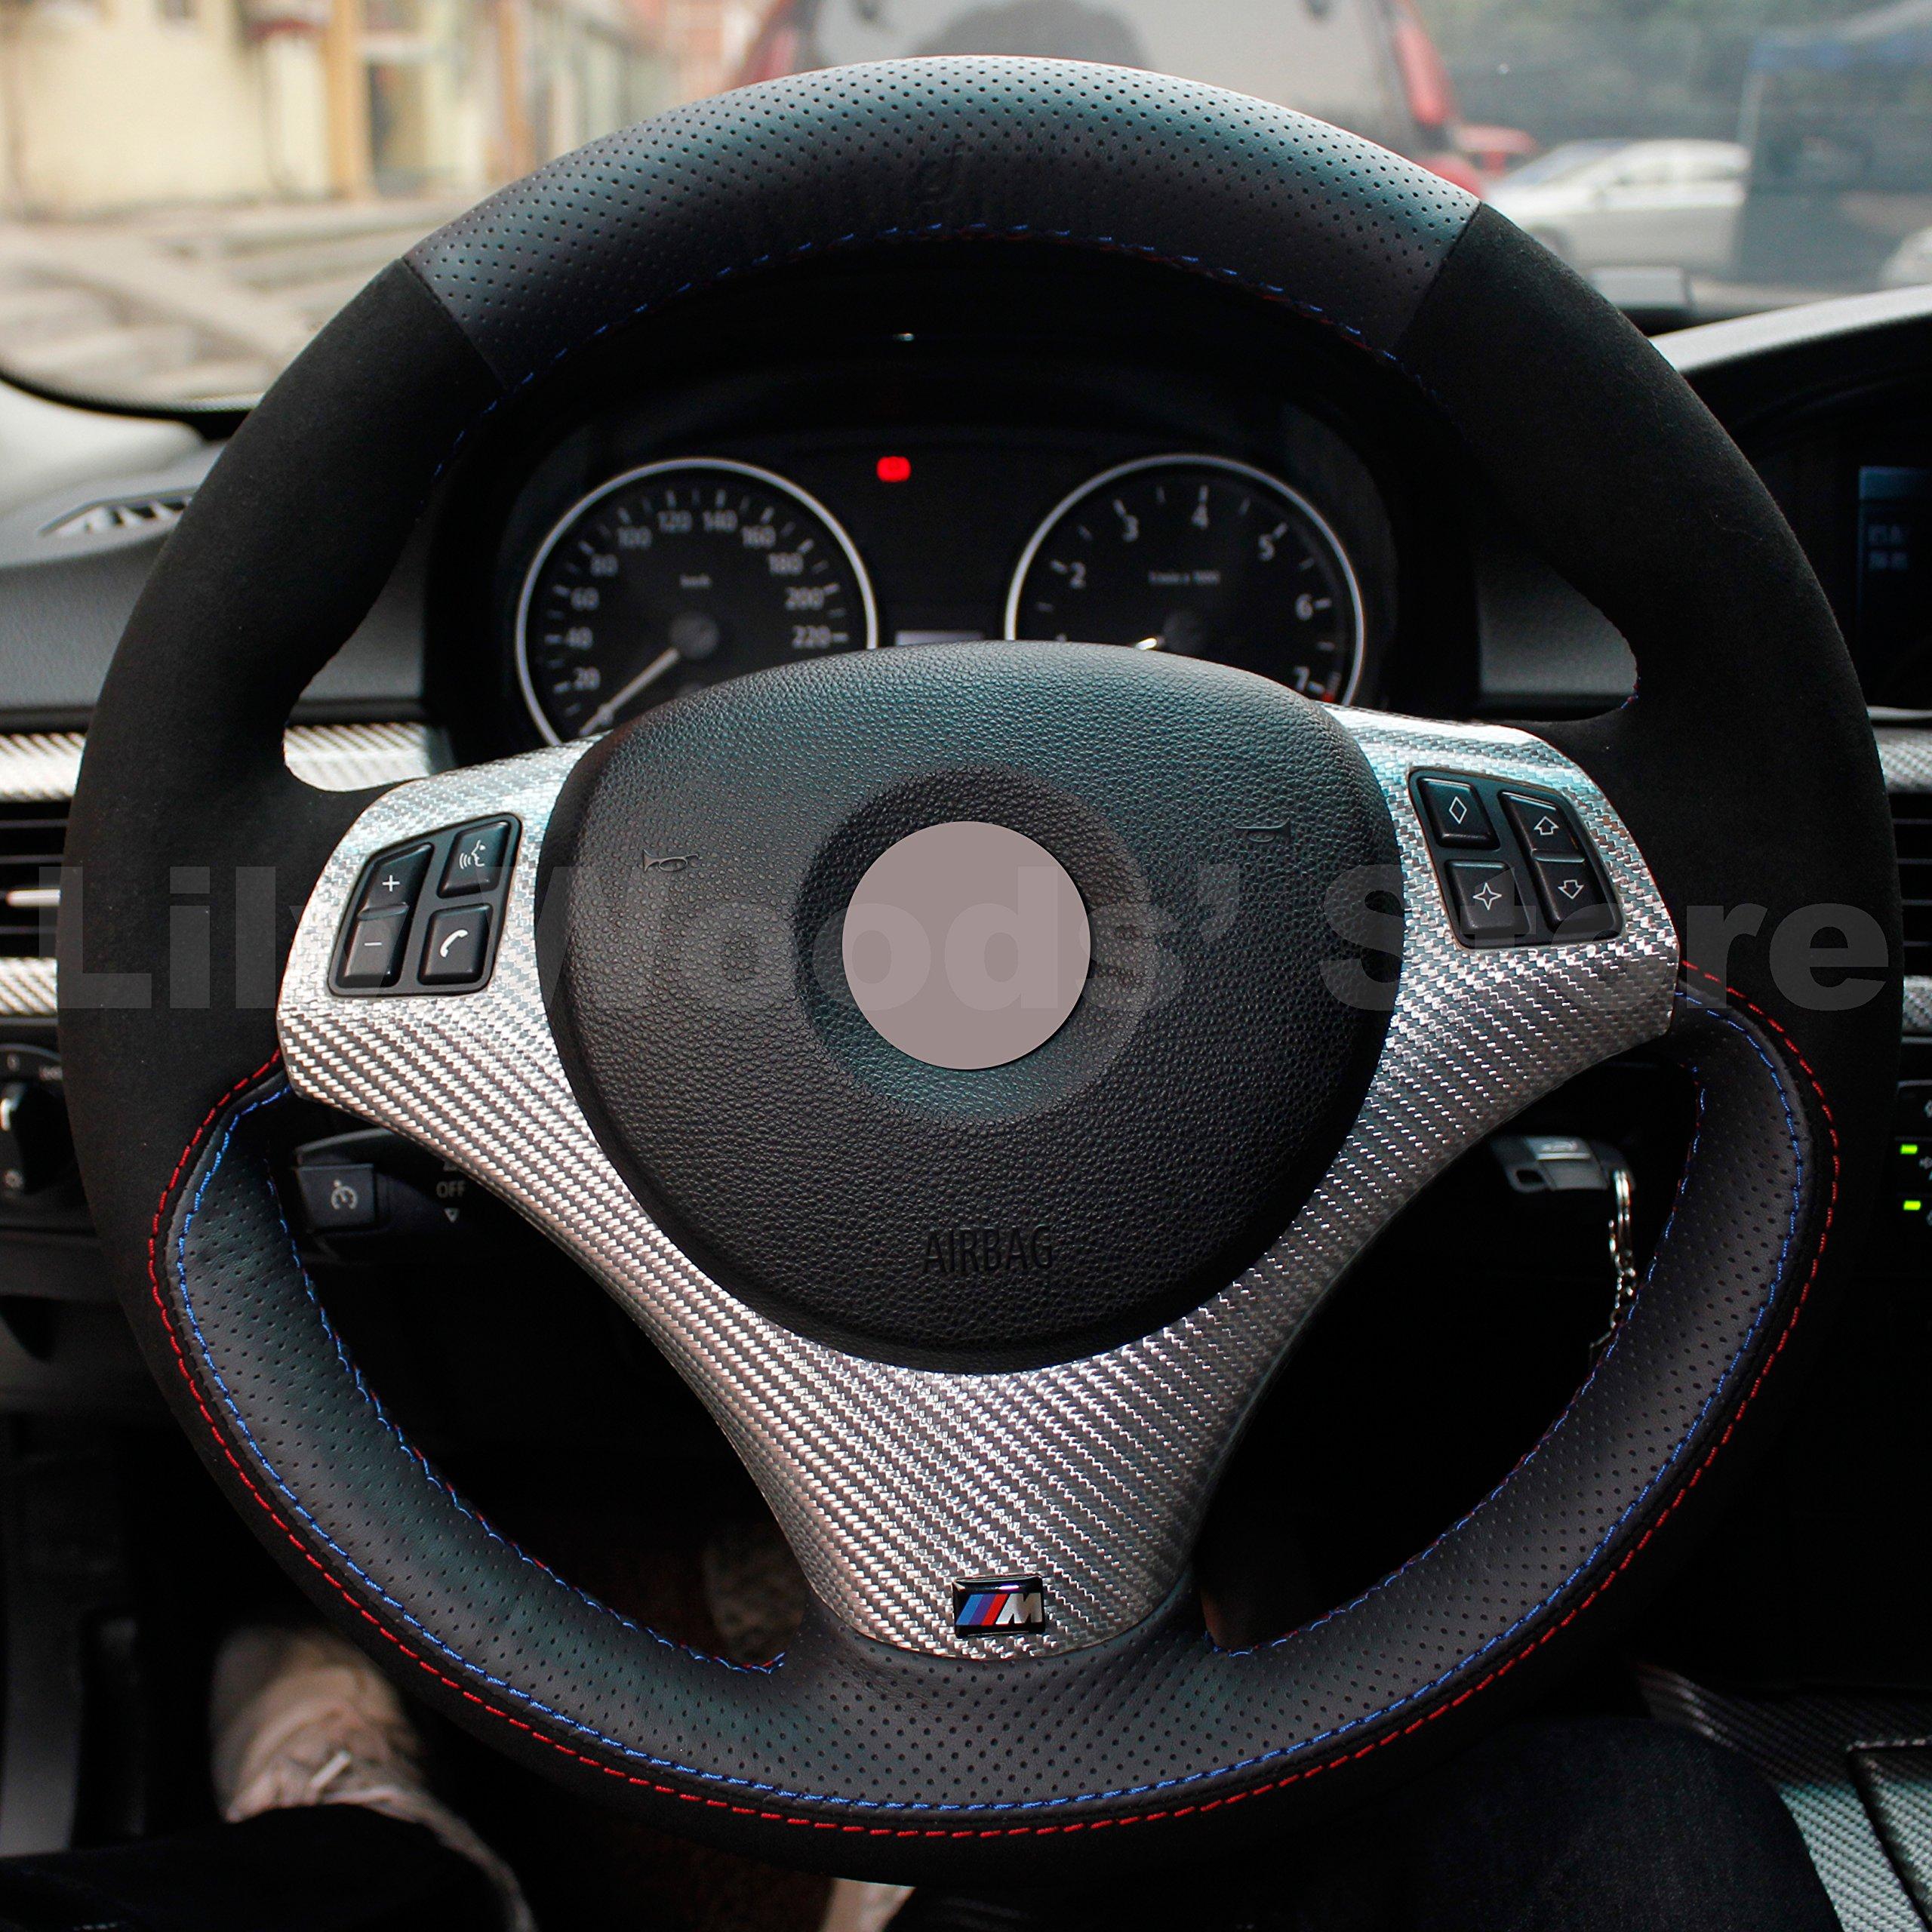 Black Thread for BMW 335i 335 Xi 335D 335i XDrive Black Microfiber Leather Interior accessories Eiseng Steering Wheel Cover for BMW 128i 135i for BMW E90 E91 325i 328i 328i XDrive//for BMW 330i